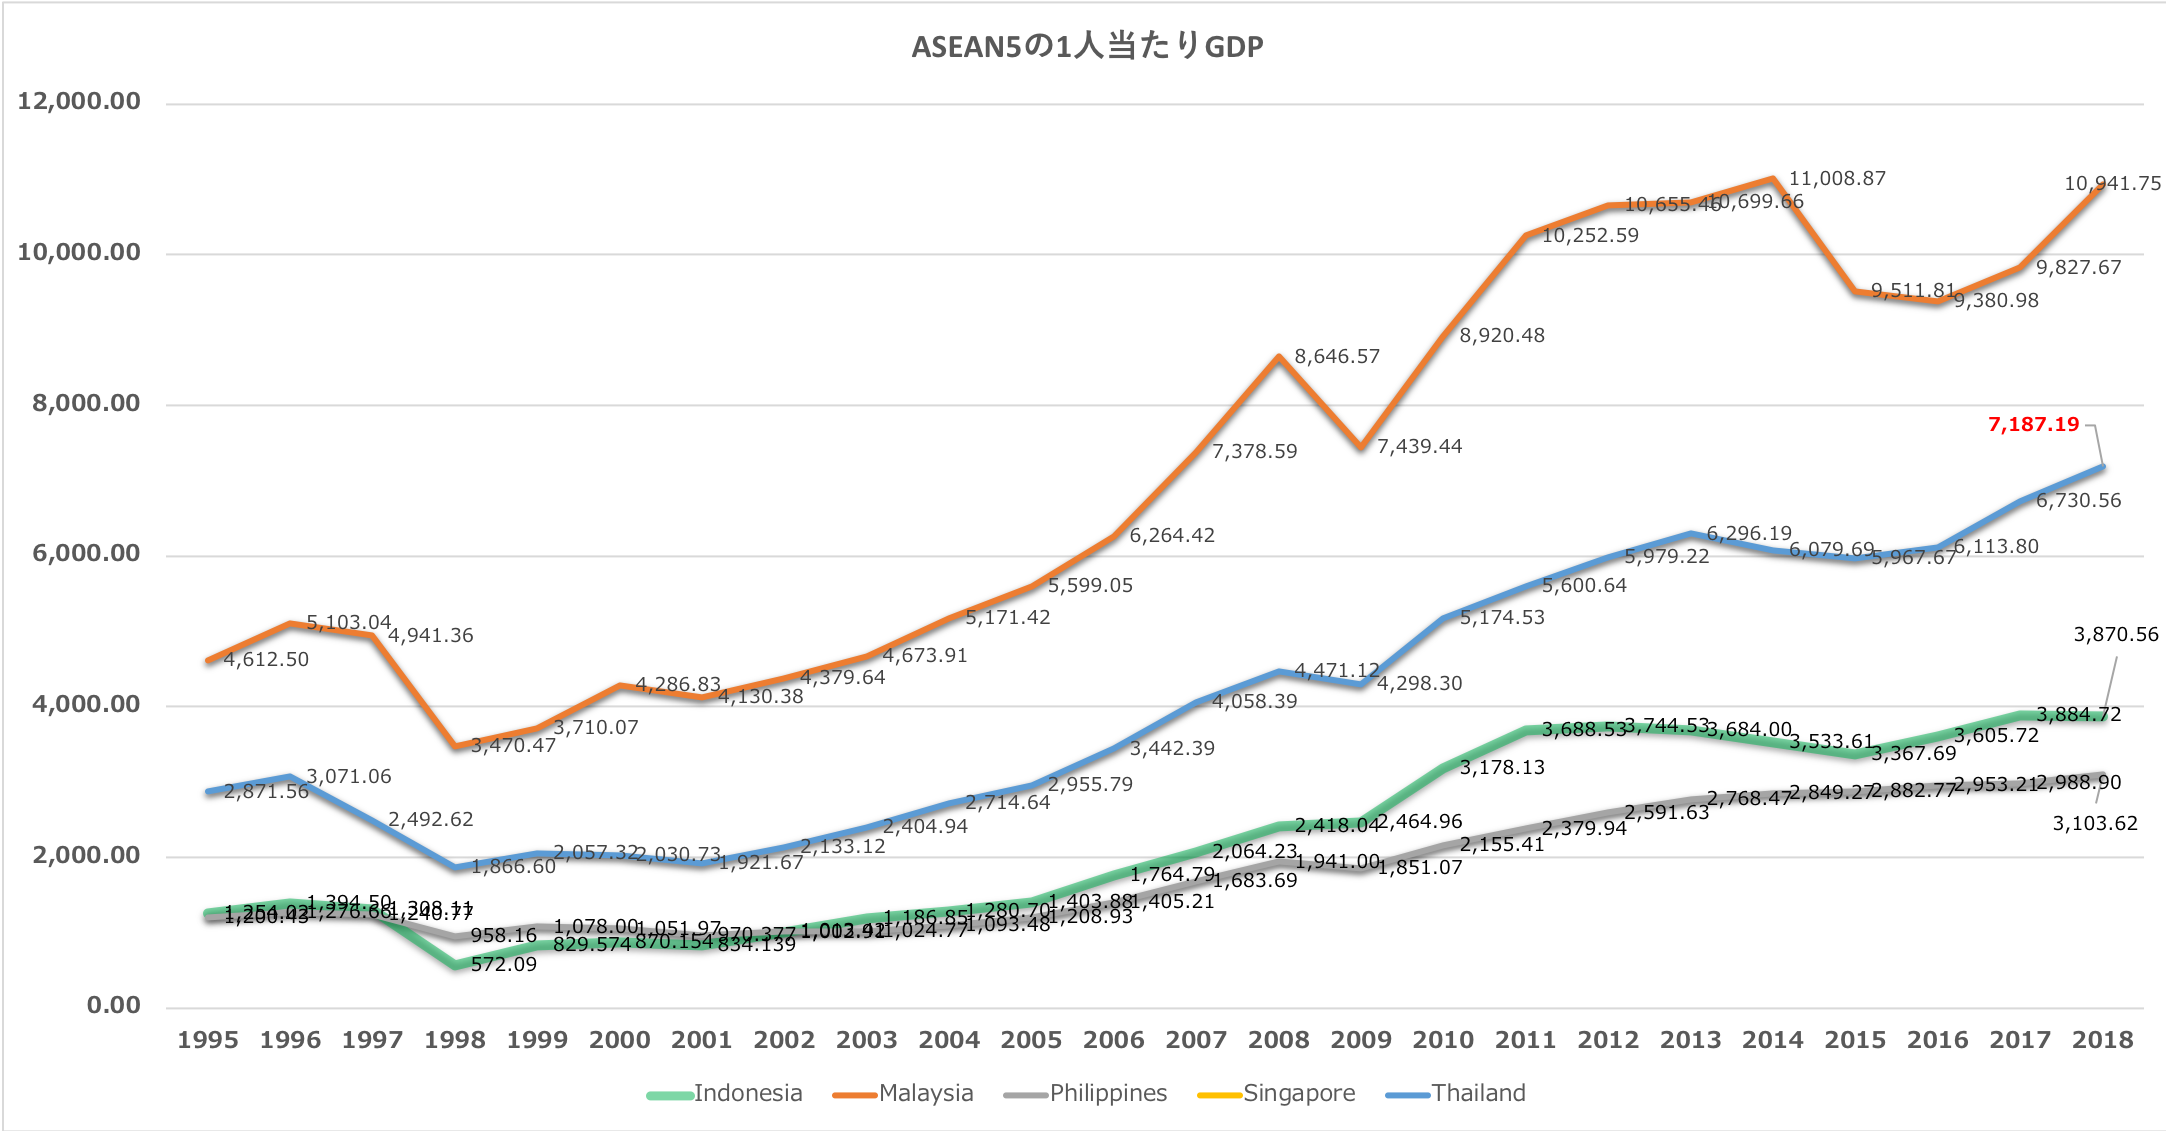 ASEAN5の一人当たりGDP